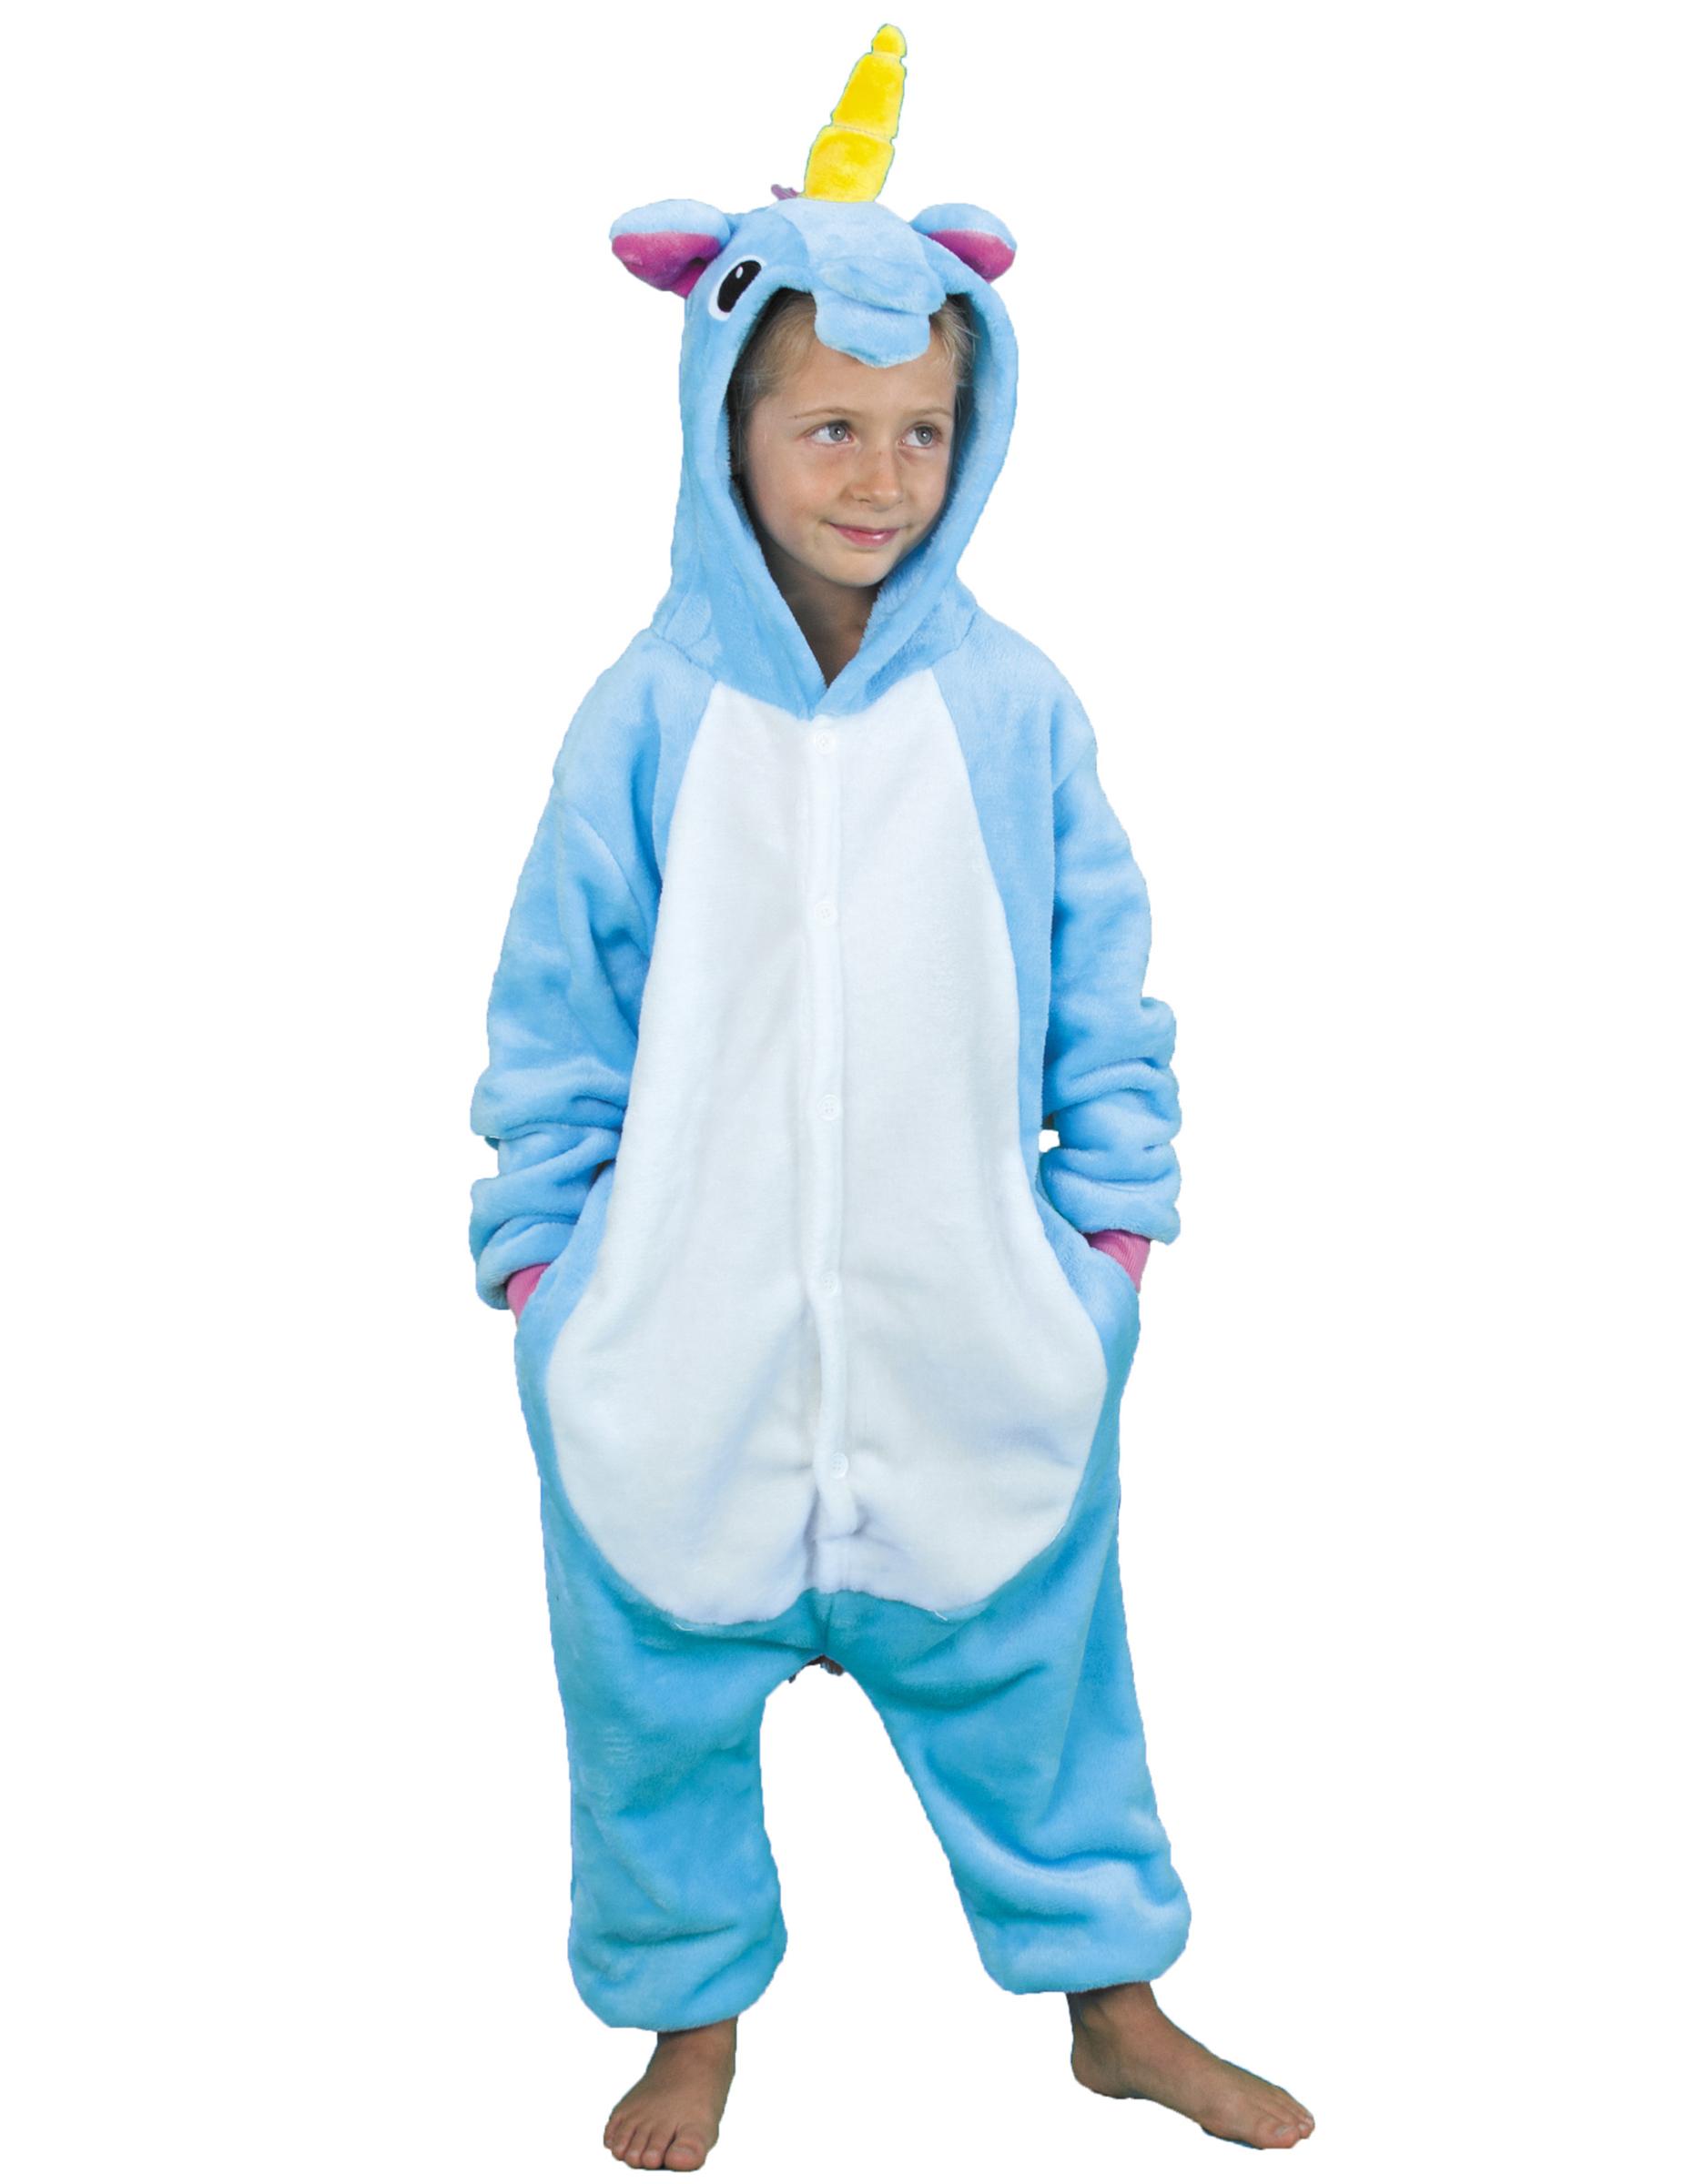 Einhorn Kostum Fur Kinder Hellblau Kostume Fur Kinder Und Gunstige